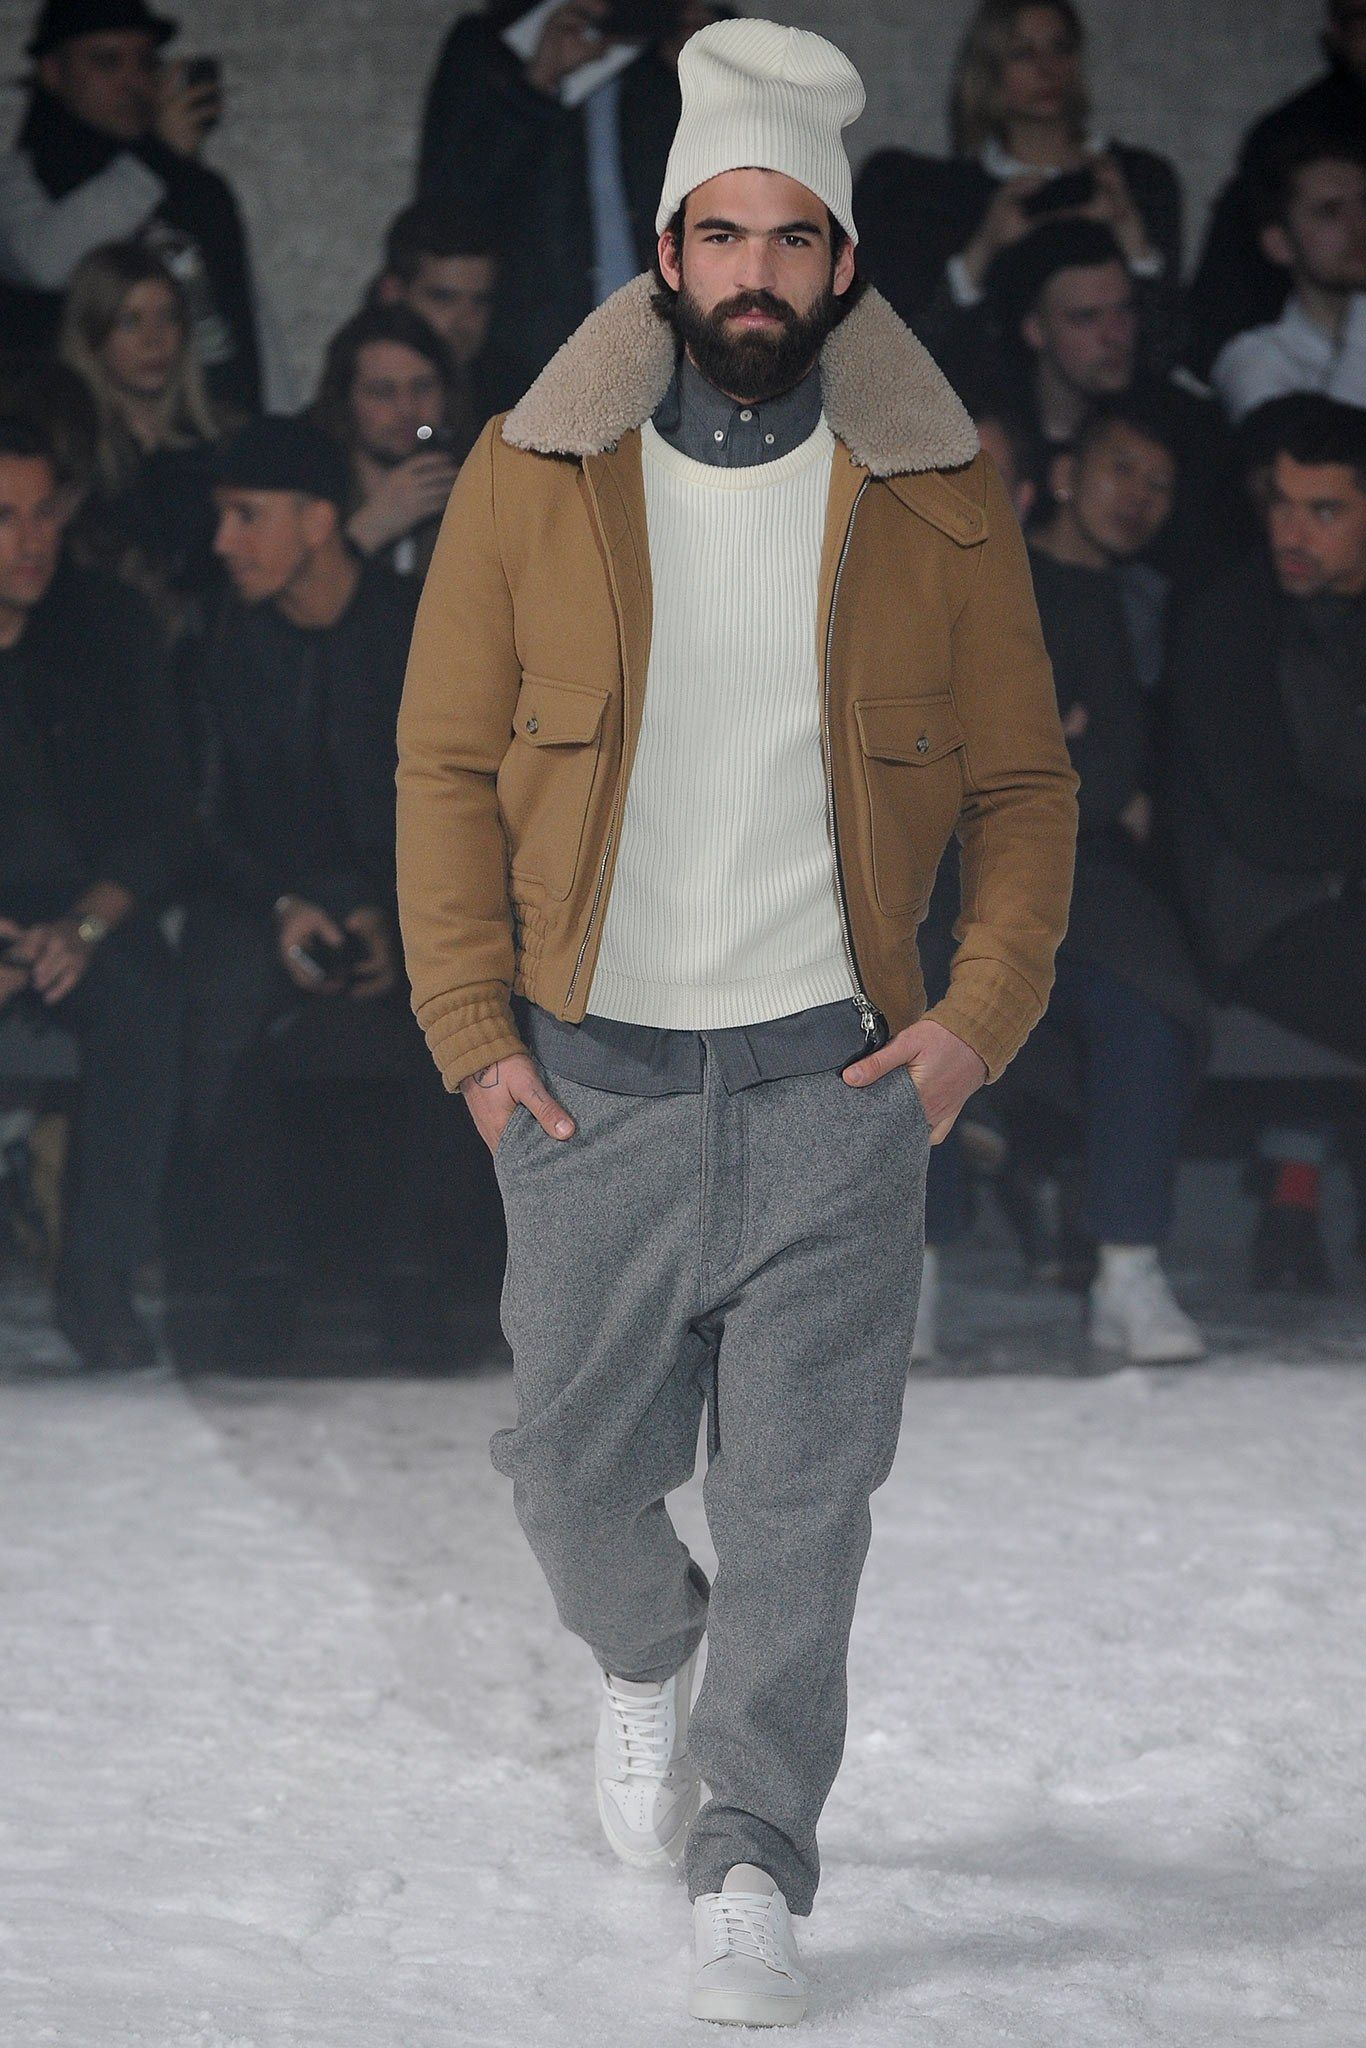 95545c351687e Sfilata Ami Milano Moda Uomo Autunno Inverno 2014-15 - Vogue Fall 14